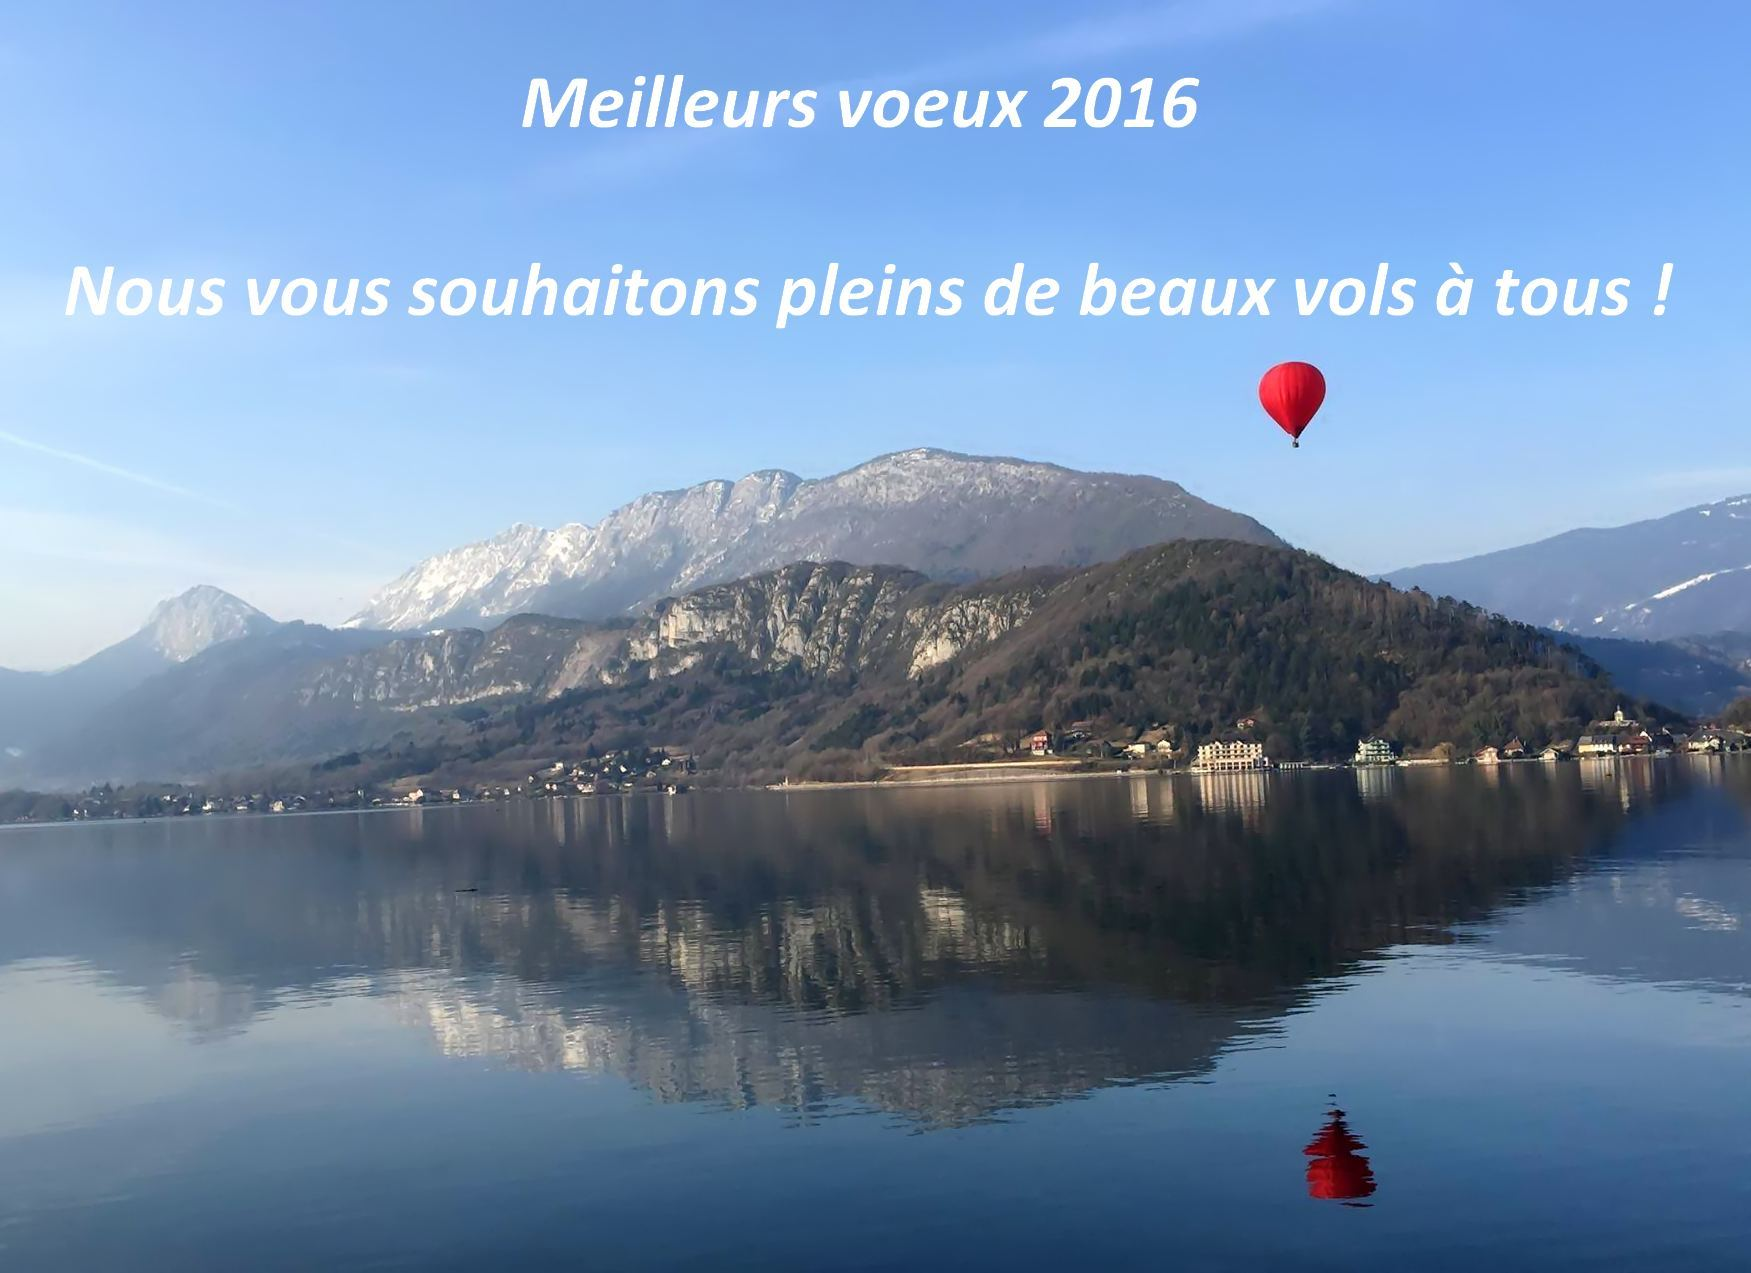 voeux montgolfiere annecy 2016